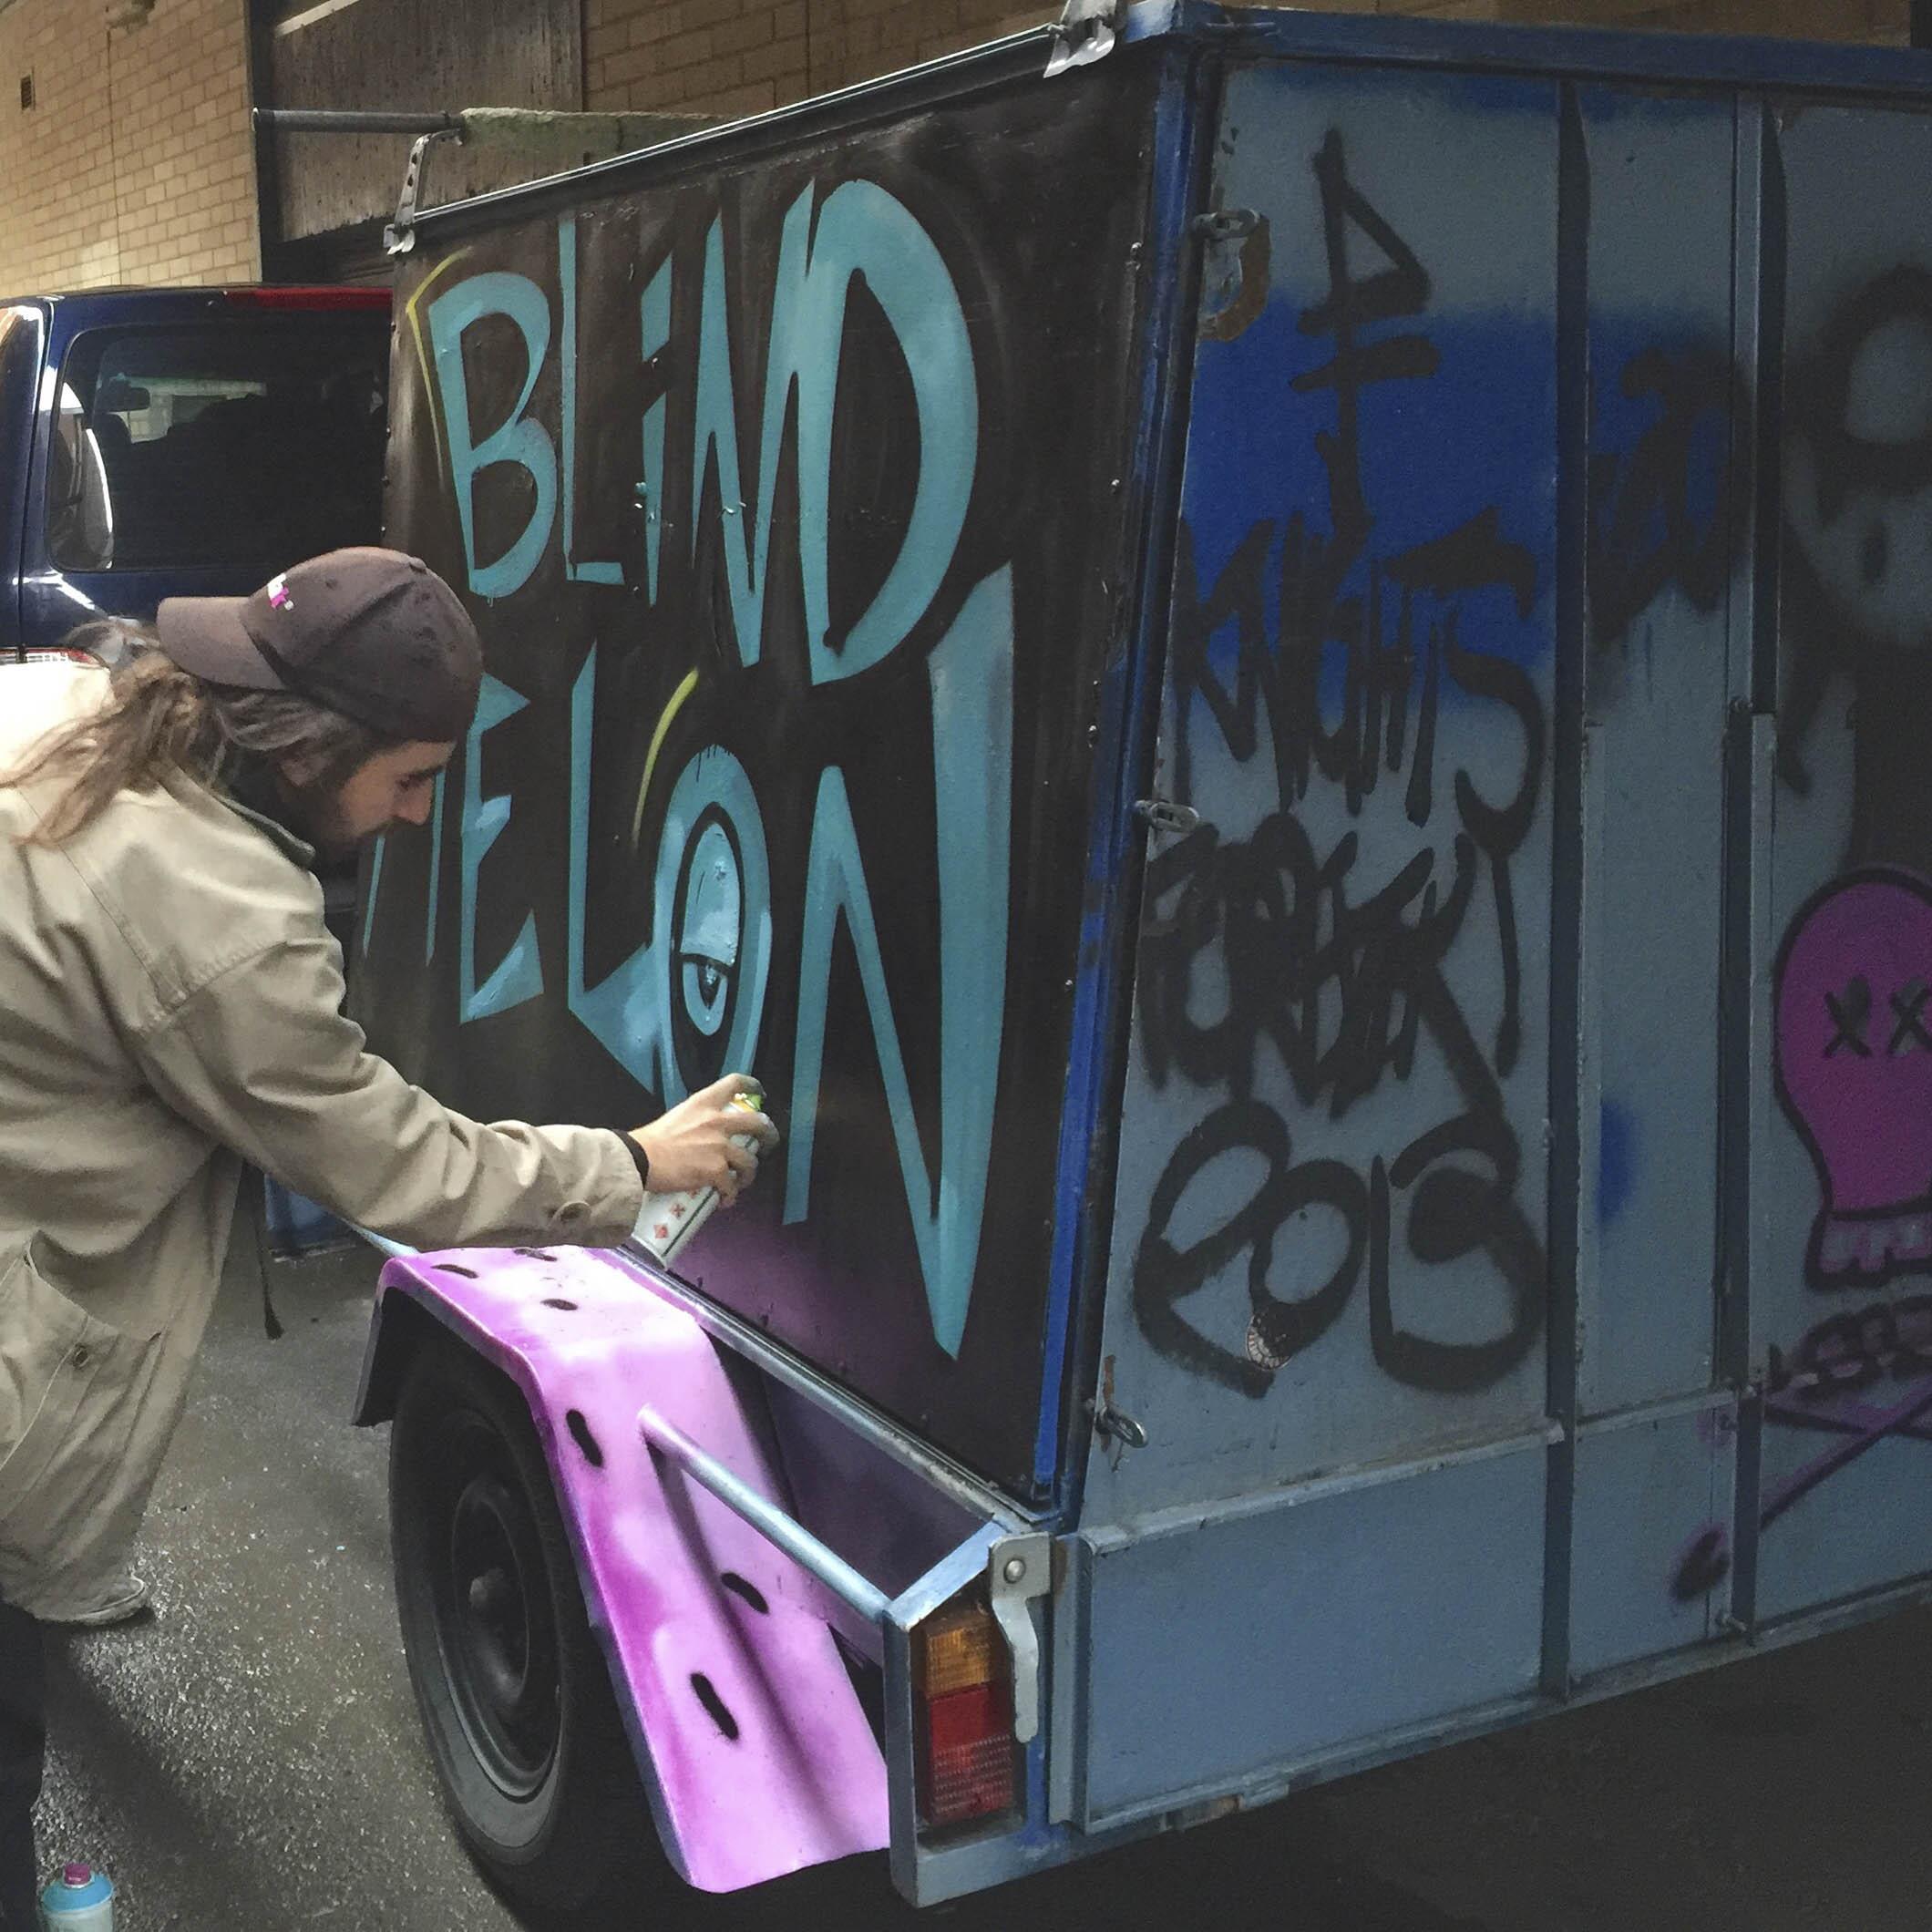 The Bennies tour trailer gets a make over